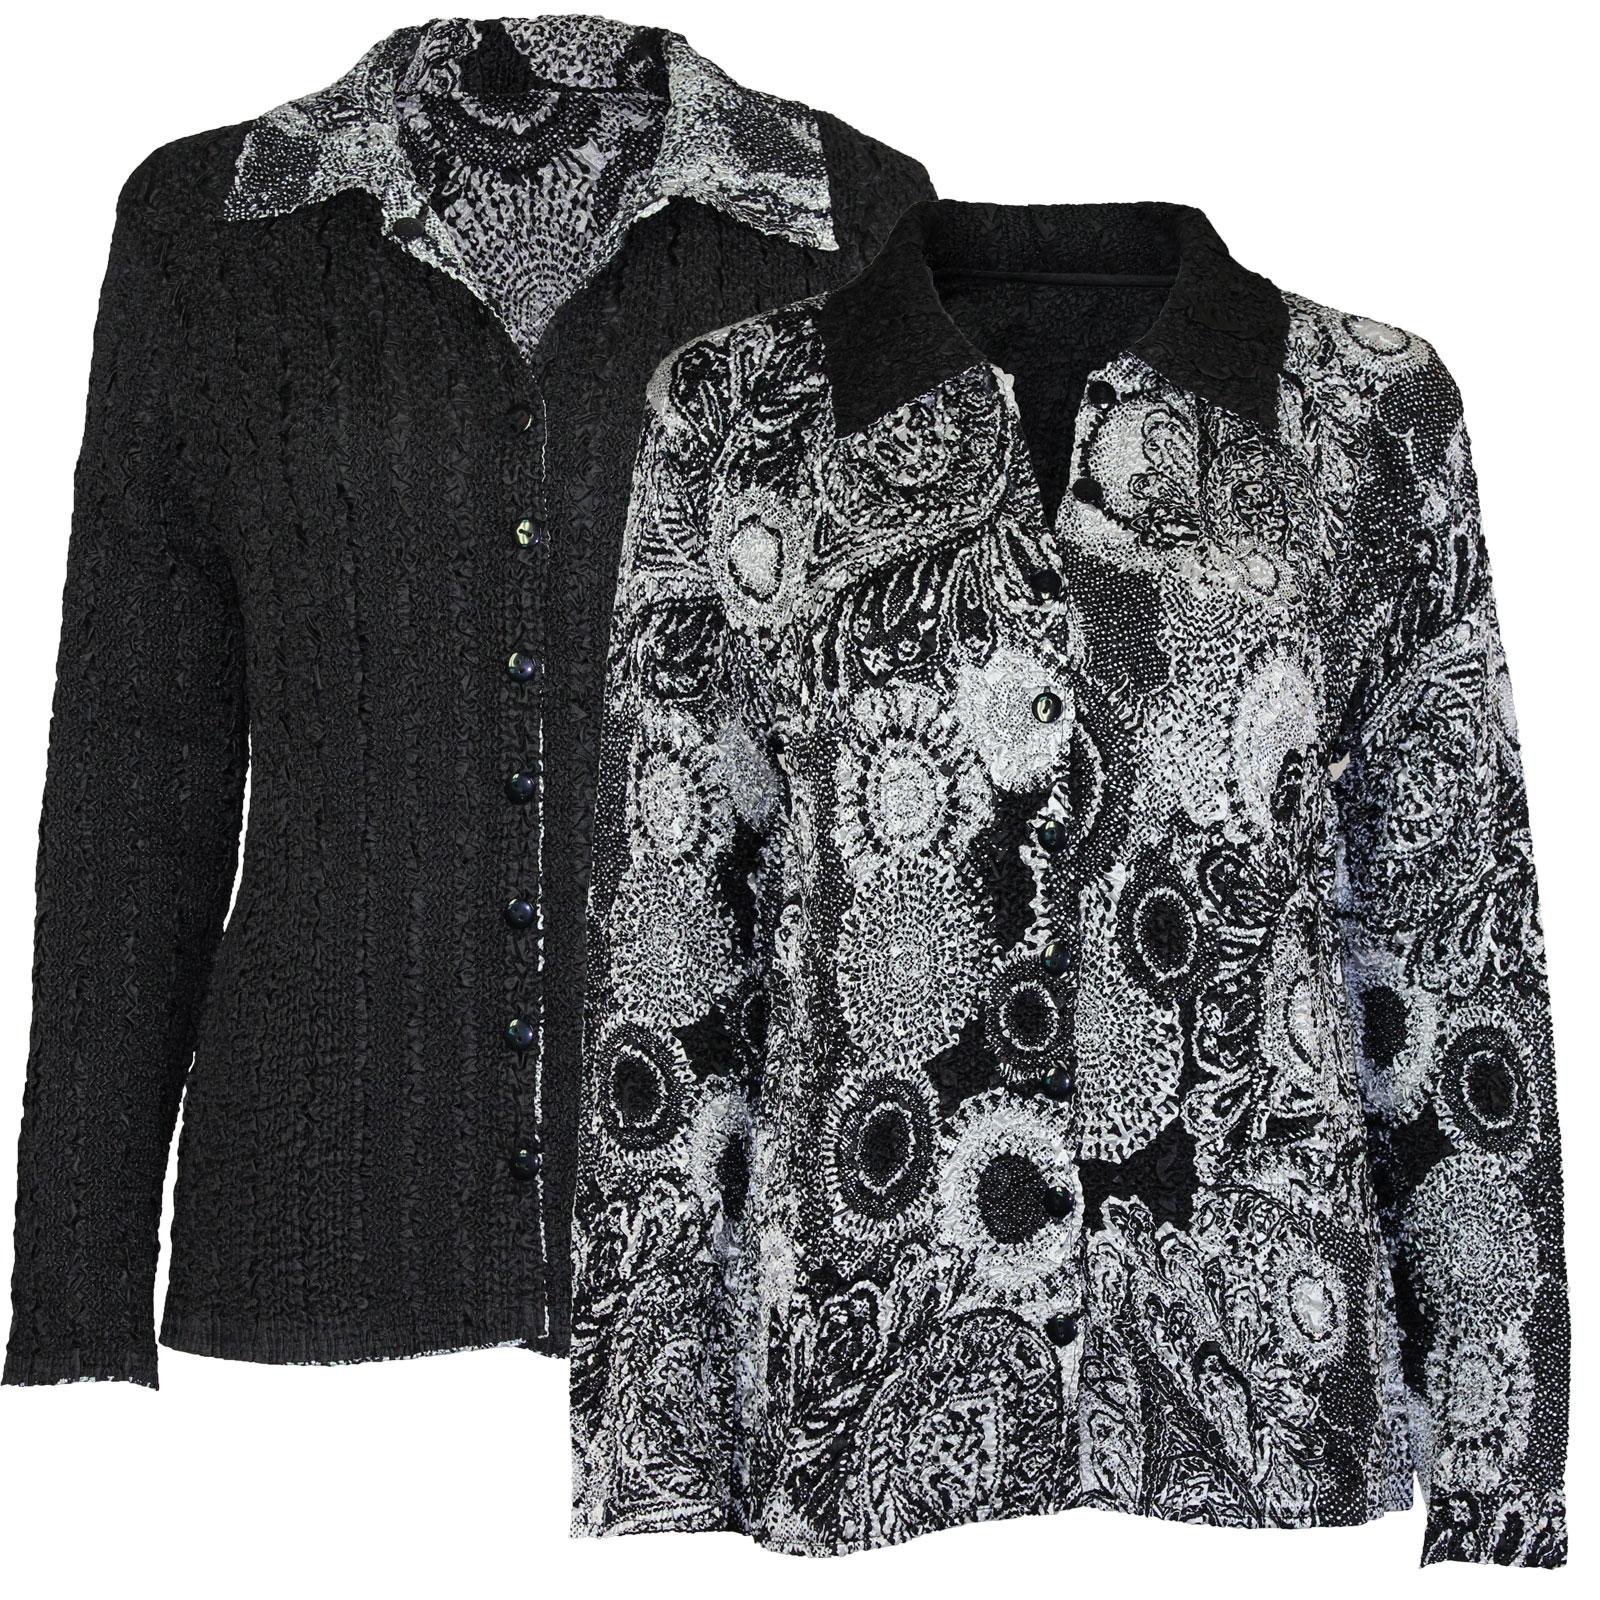 Wholesale Magic Crush - Reversible Jackets #14018 MB - L-XL